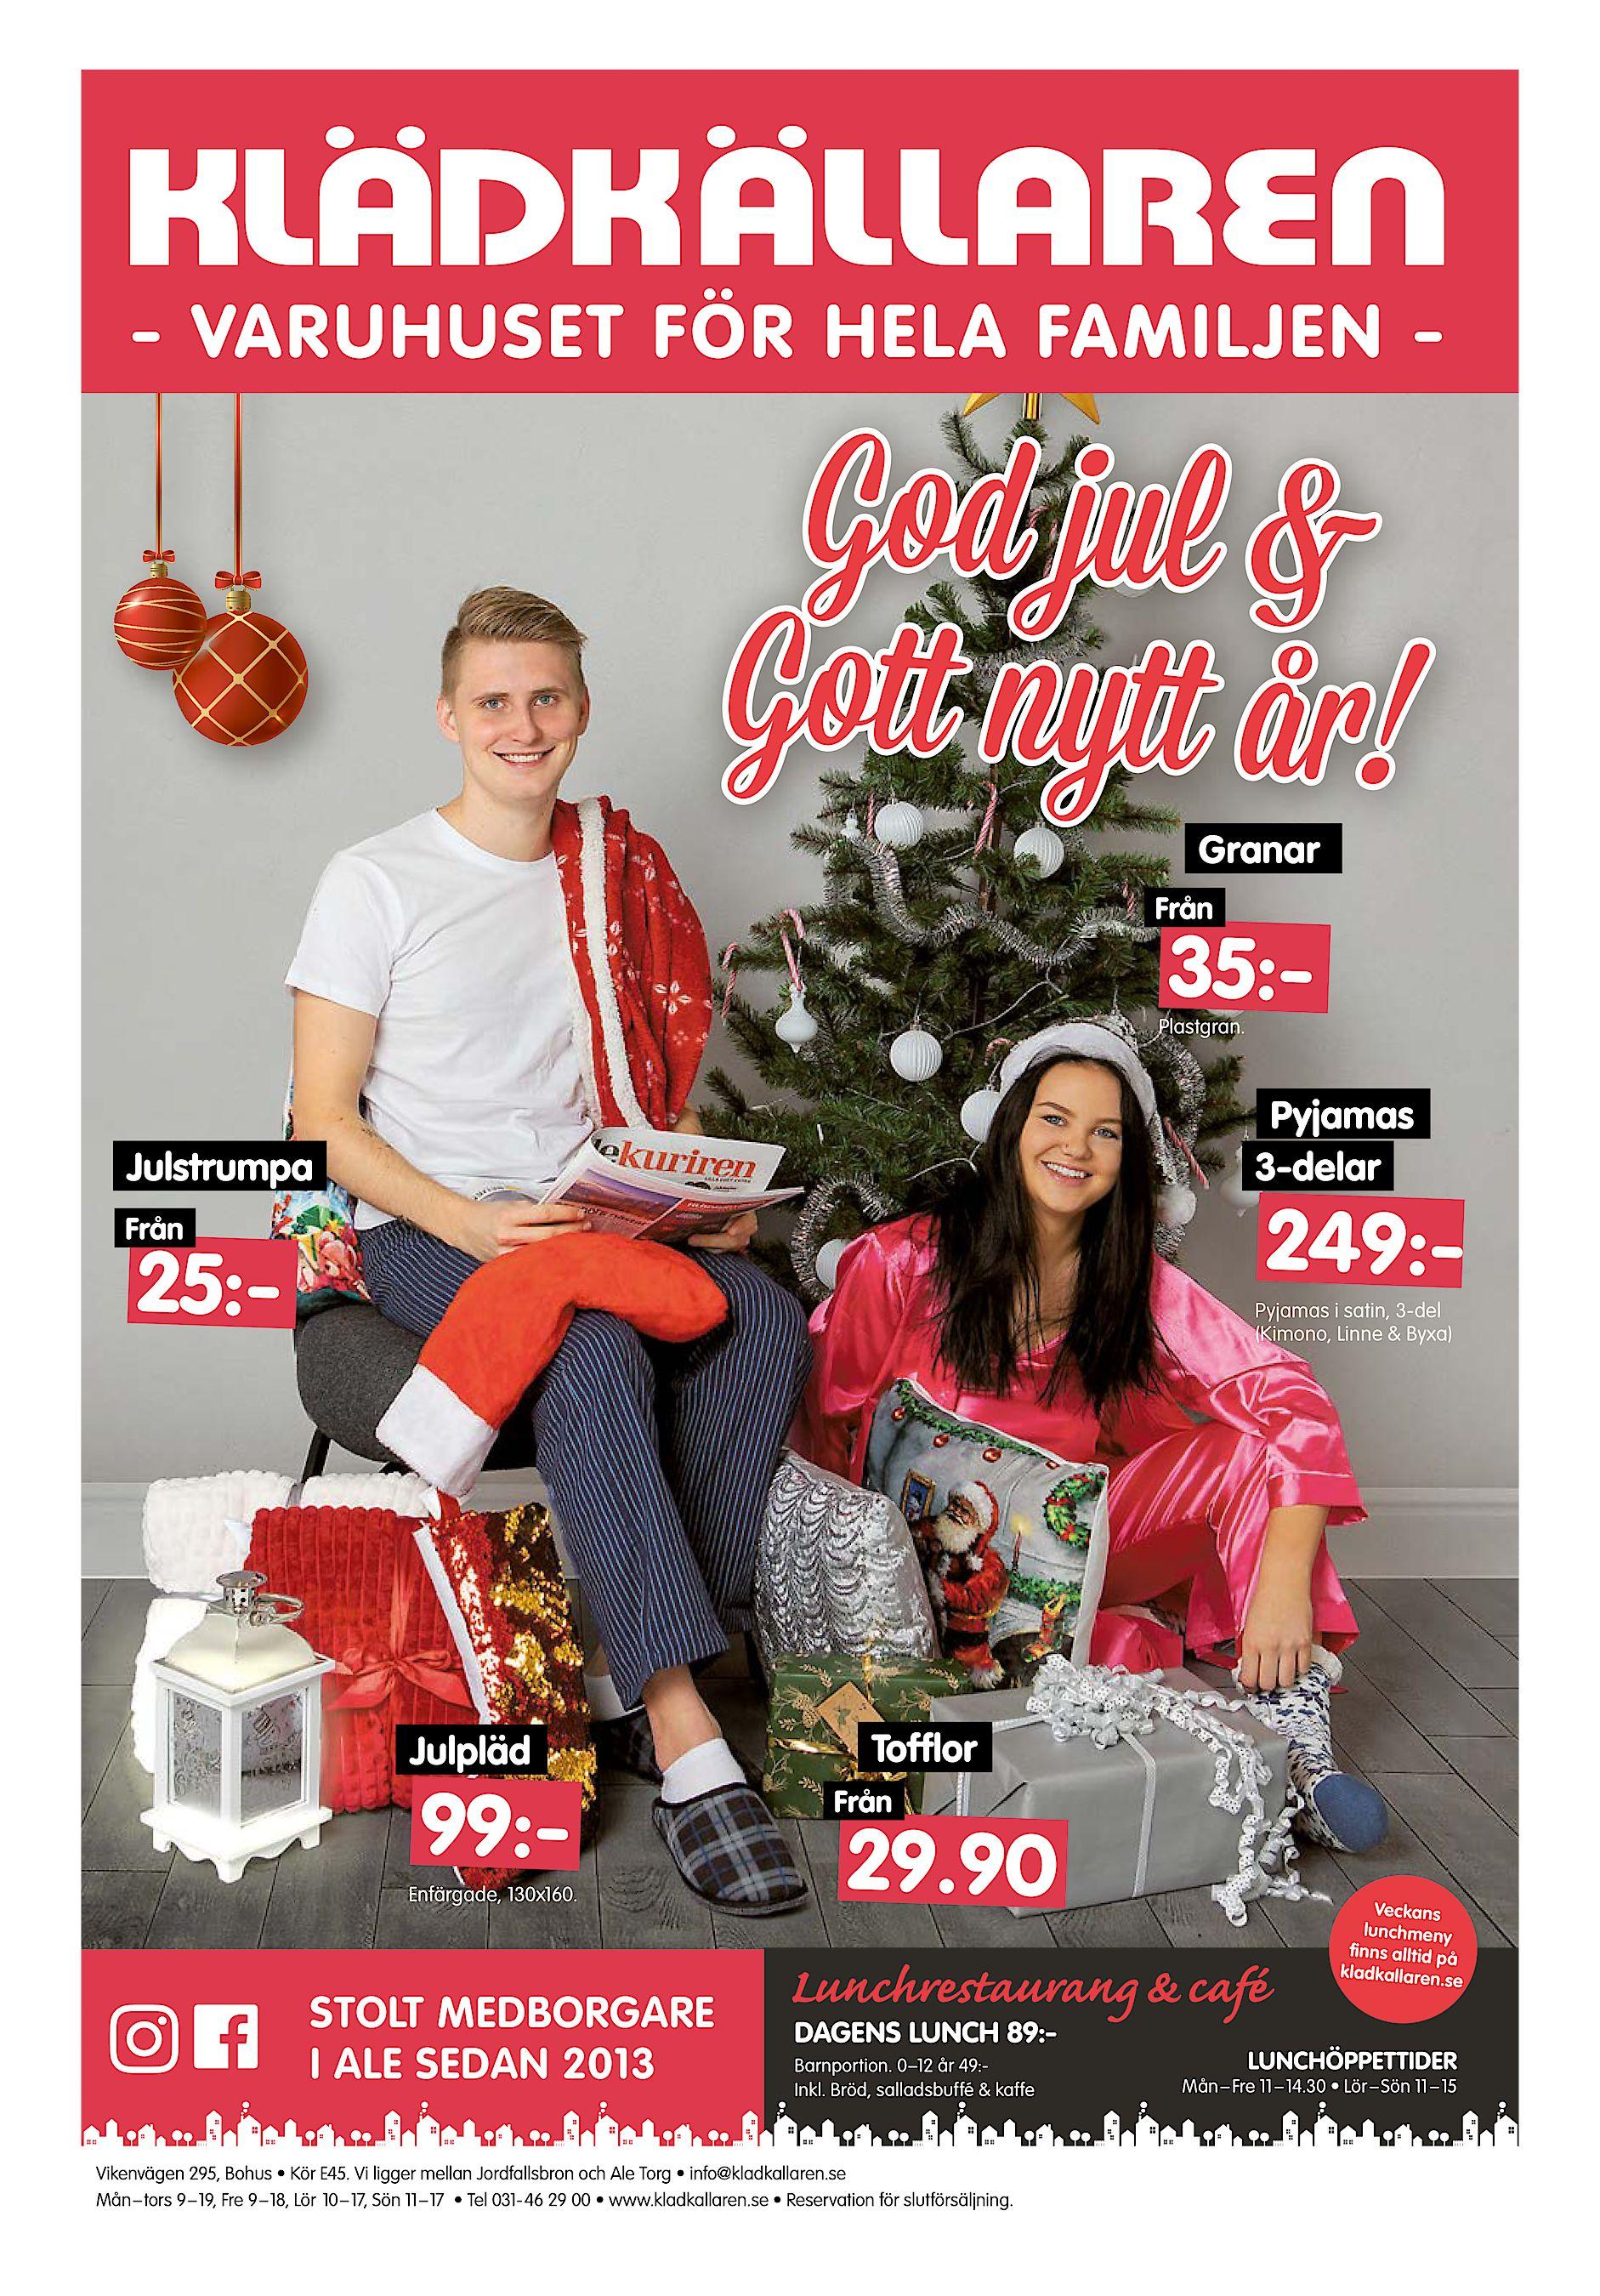 Härrydaposten   Partille Tidning PT-2018-12-20 (endast text) a62702f16934b